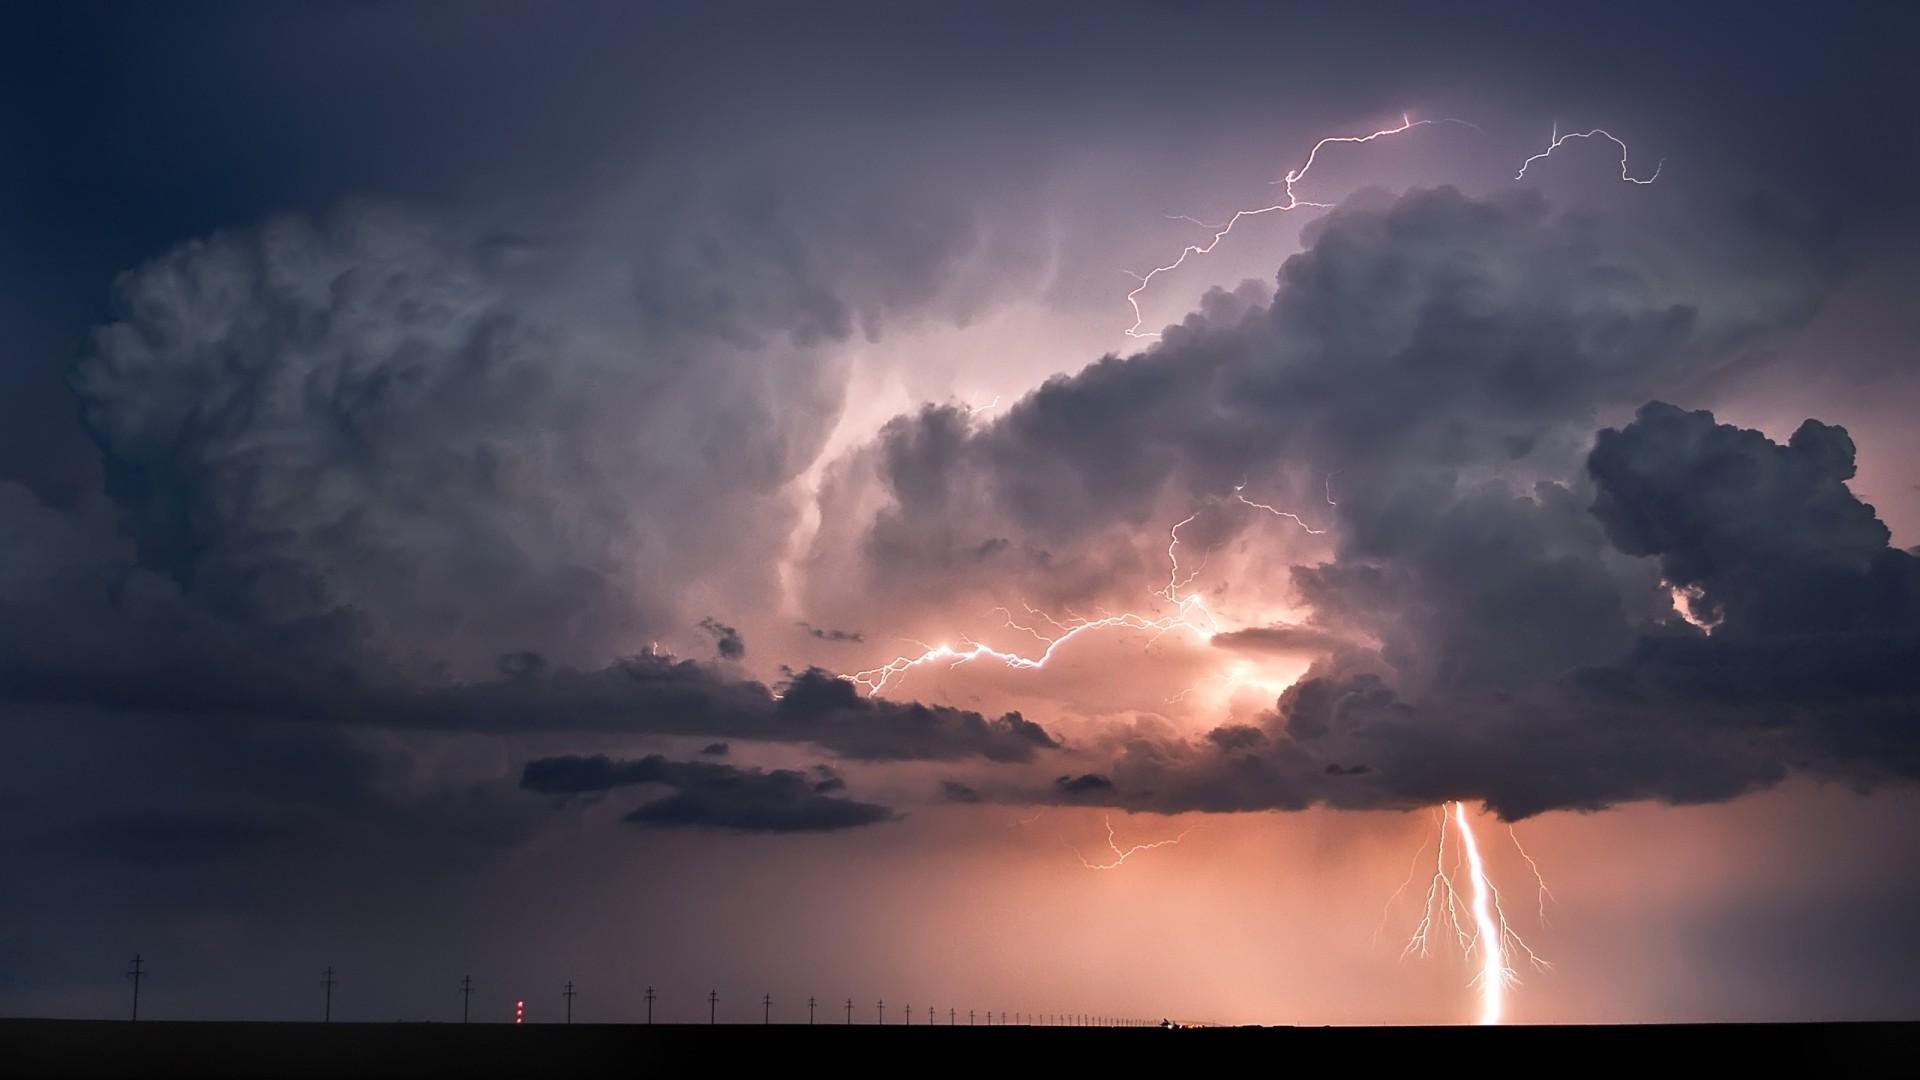 wallpaper : 1920x1080 px, clouds, horizon, landscape, lightning